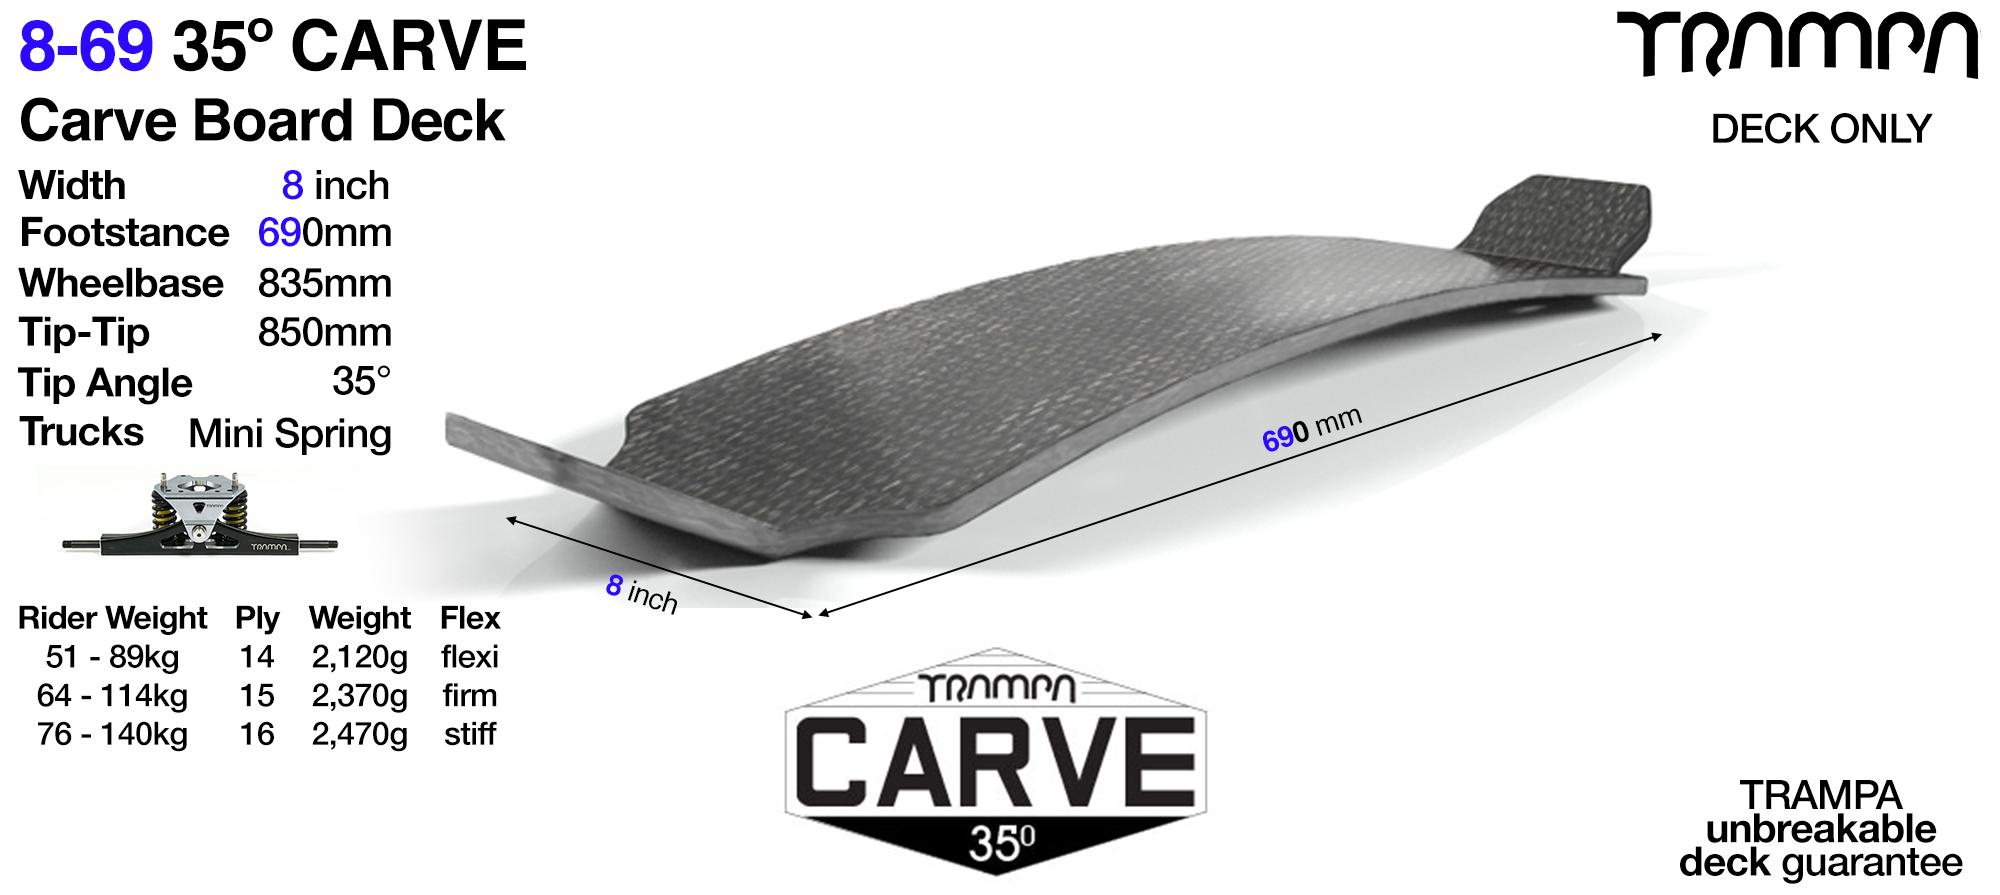 35° Original 9-69 Carve Deck